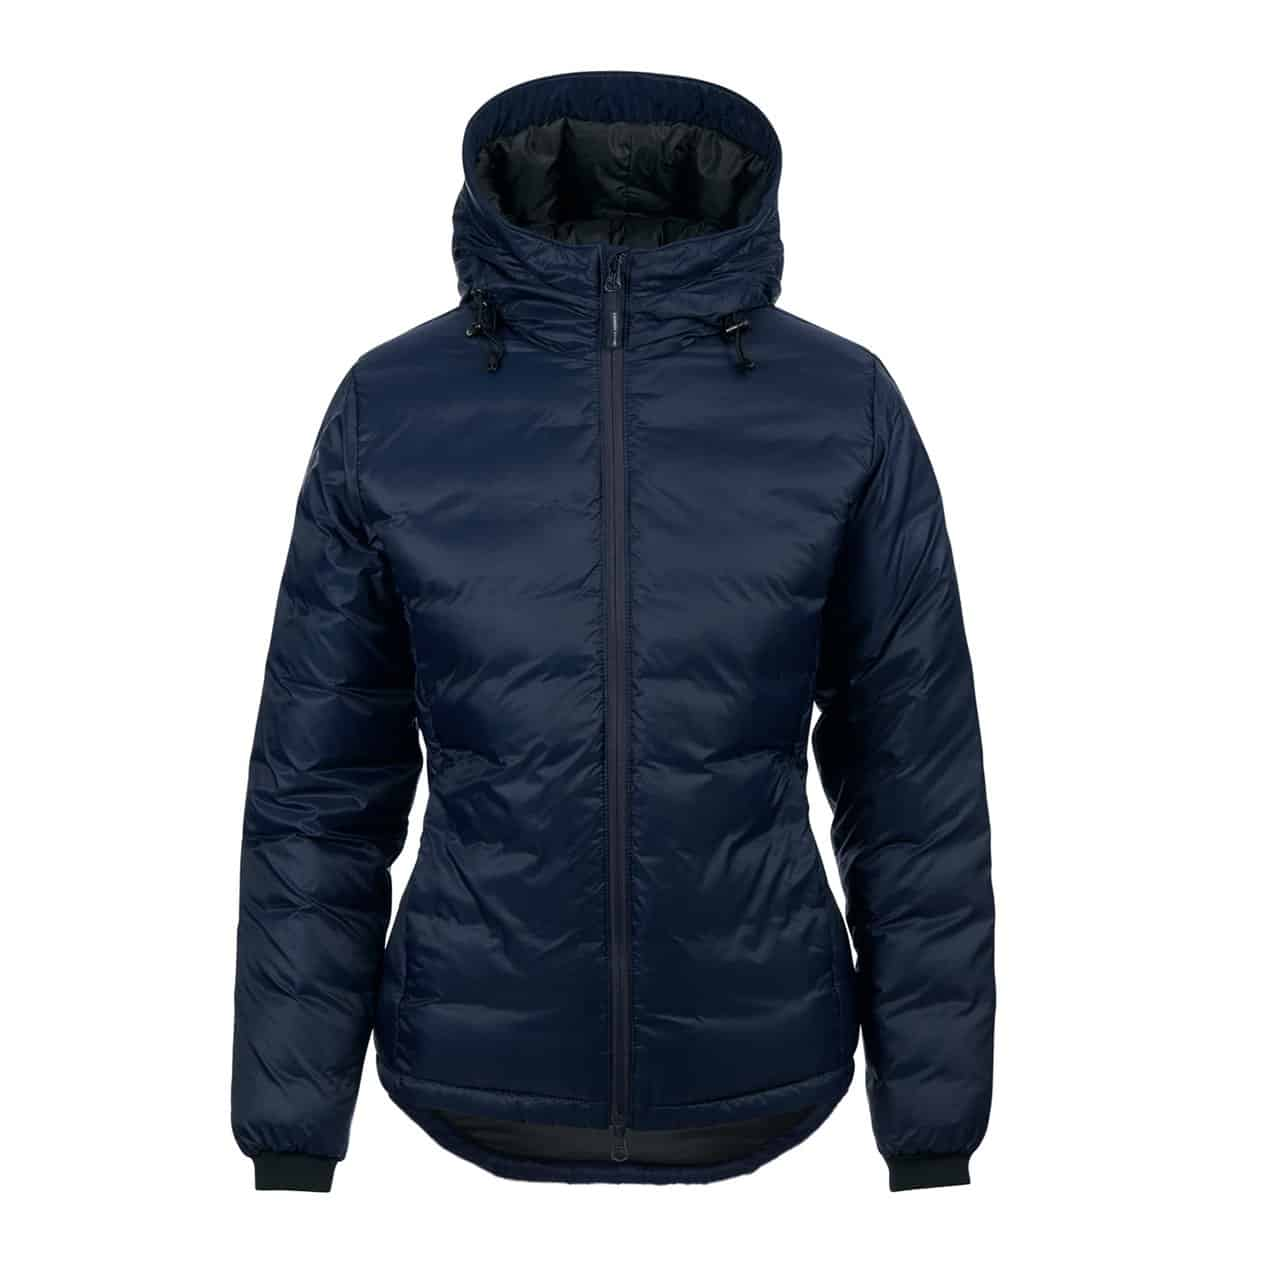 54d28ee9123b Women s top light down jackets. 1. Camp Down Hoody